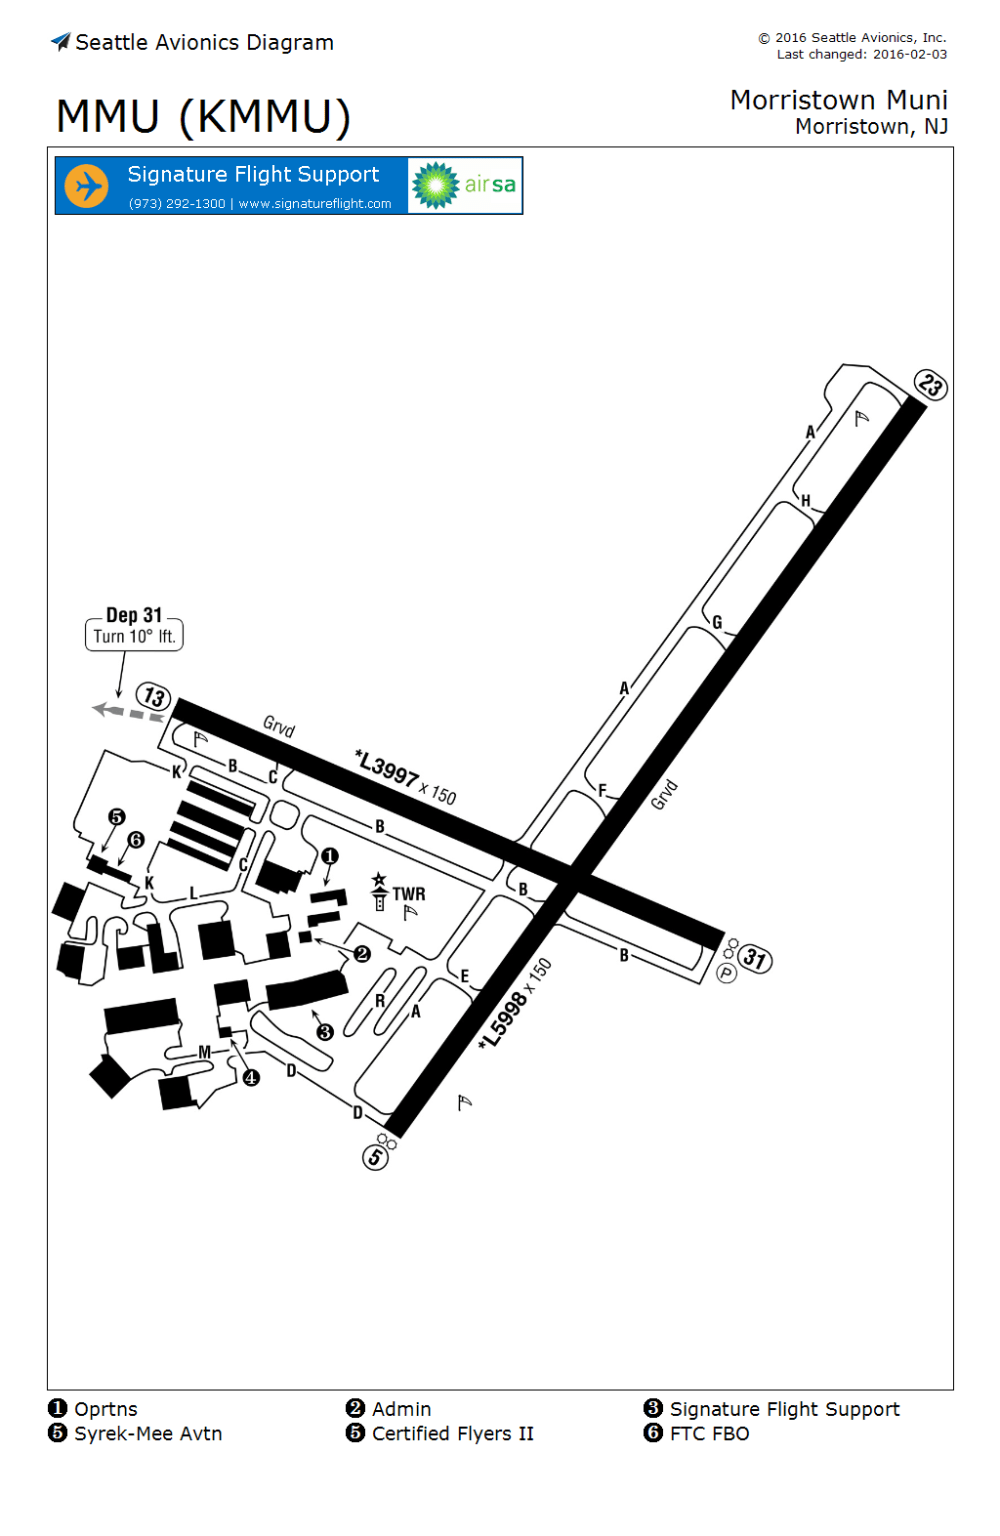 Strut 2 Sample Sequence Diagram - morristown airport diagram